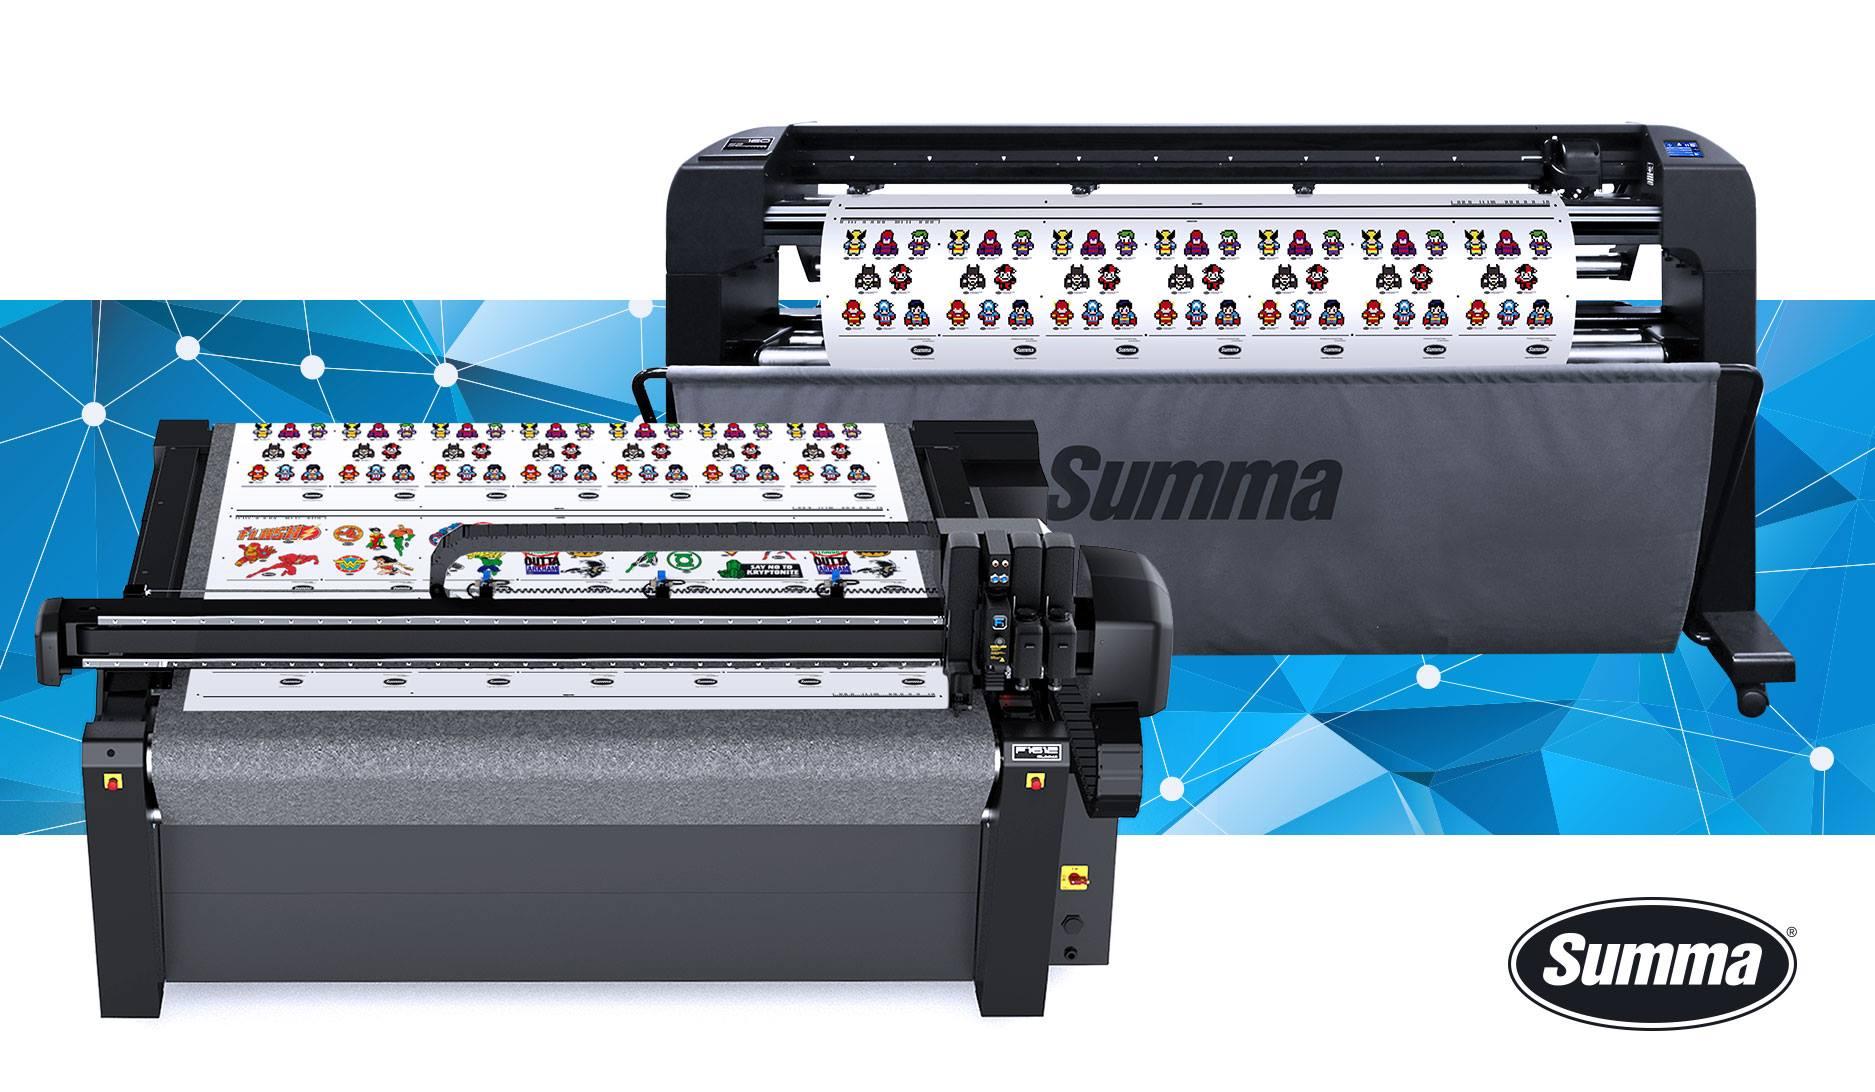 Summa Printing Machine Malaysia, Roland Printer, Cutter